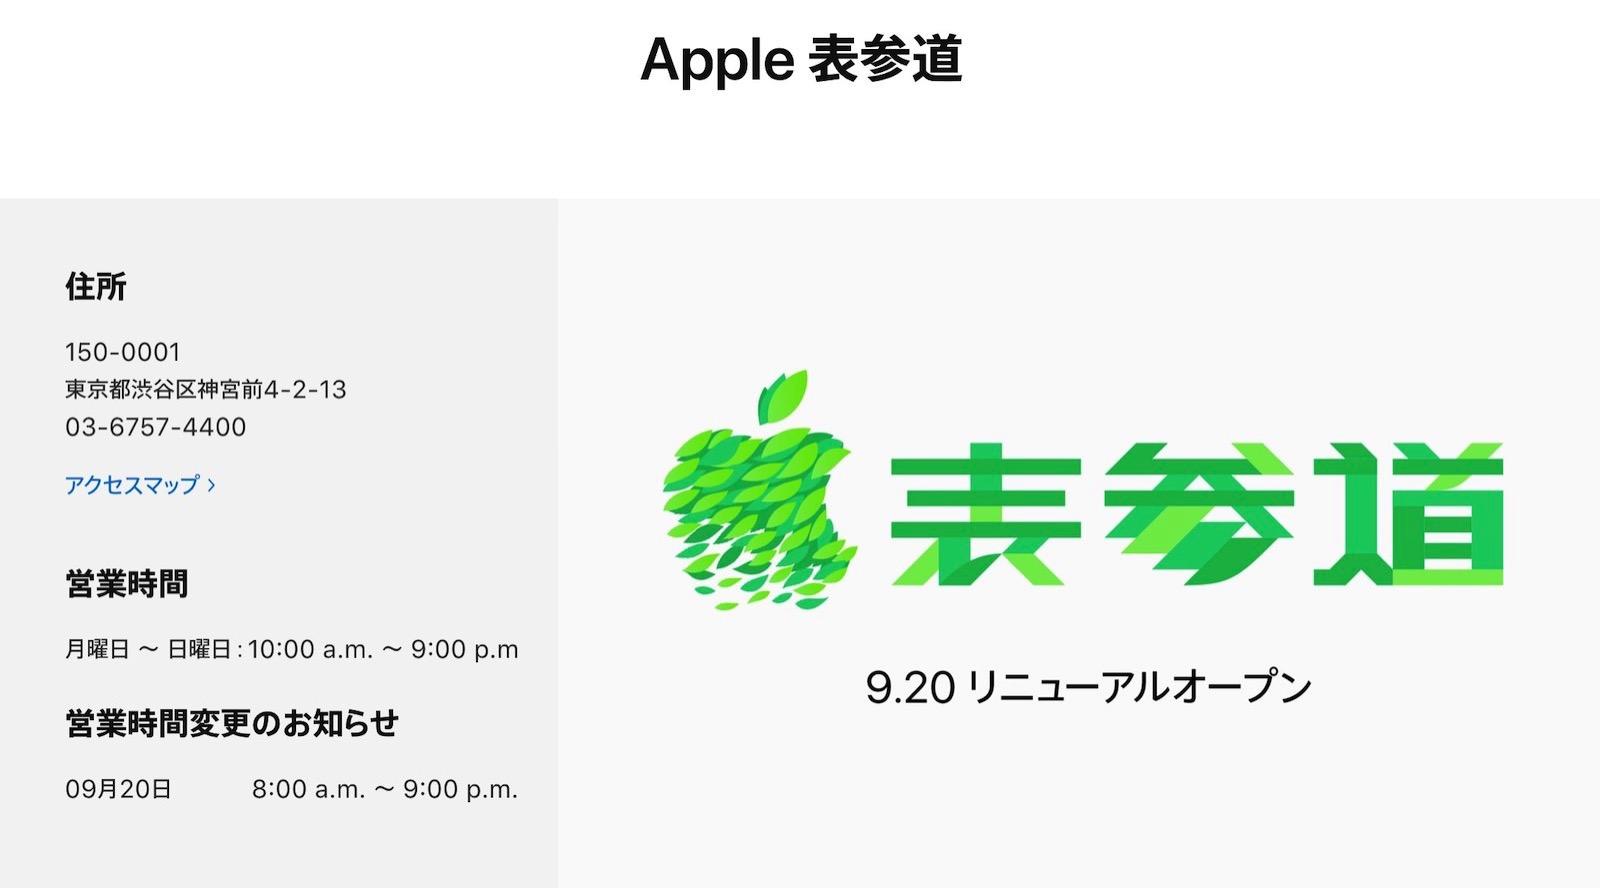 Apple-Omotesando-Renewal-Open-Sep20.jpg